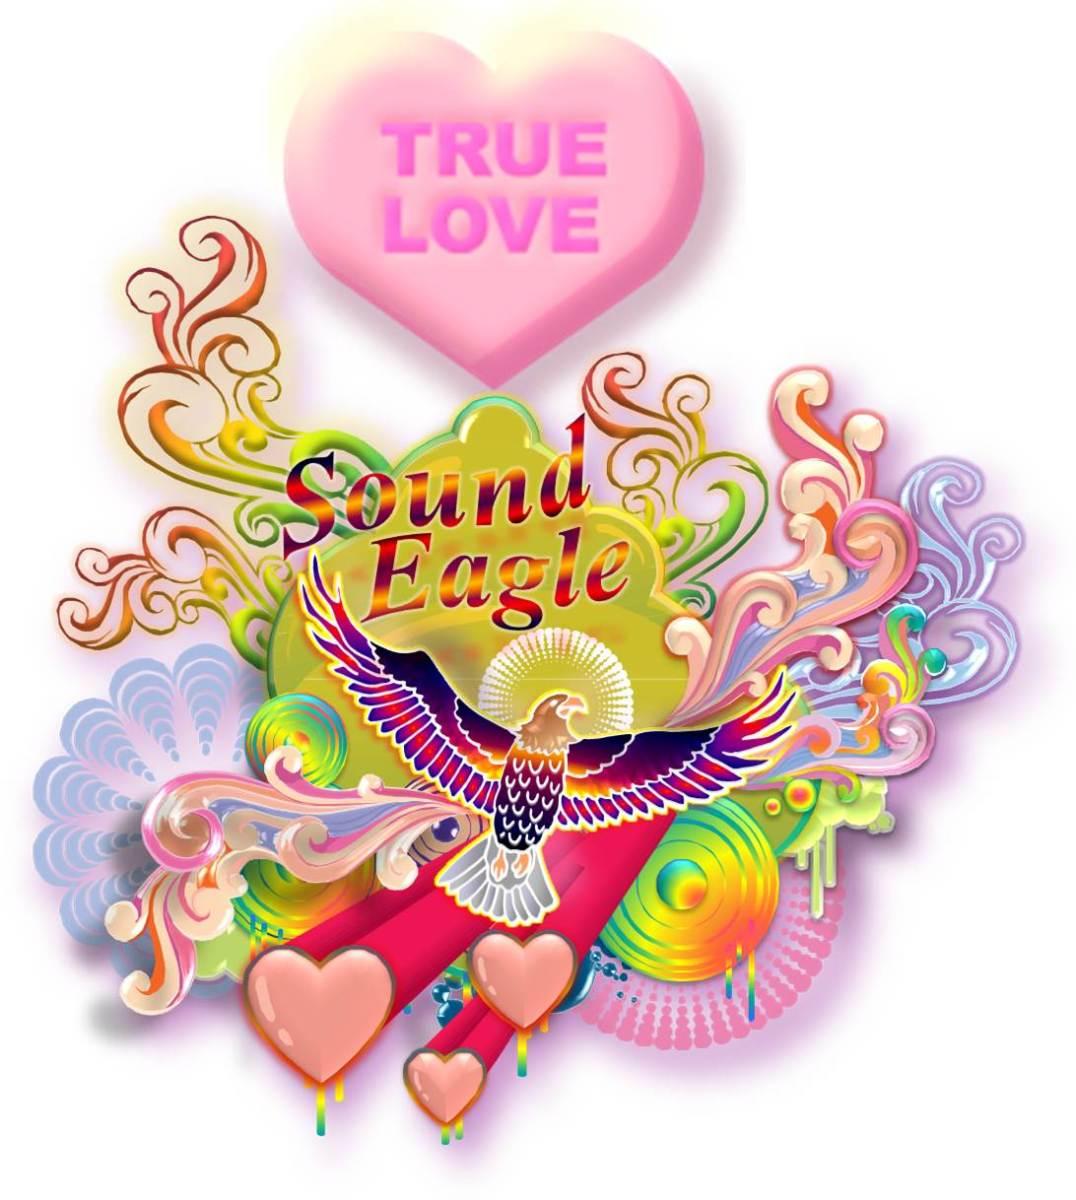 SoundEagle in True Love, Three Hearts and Swirls of Gypsy Delight